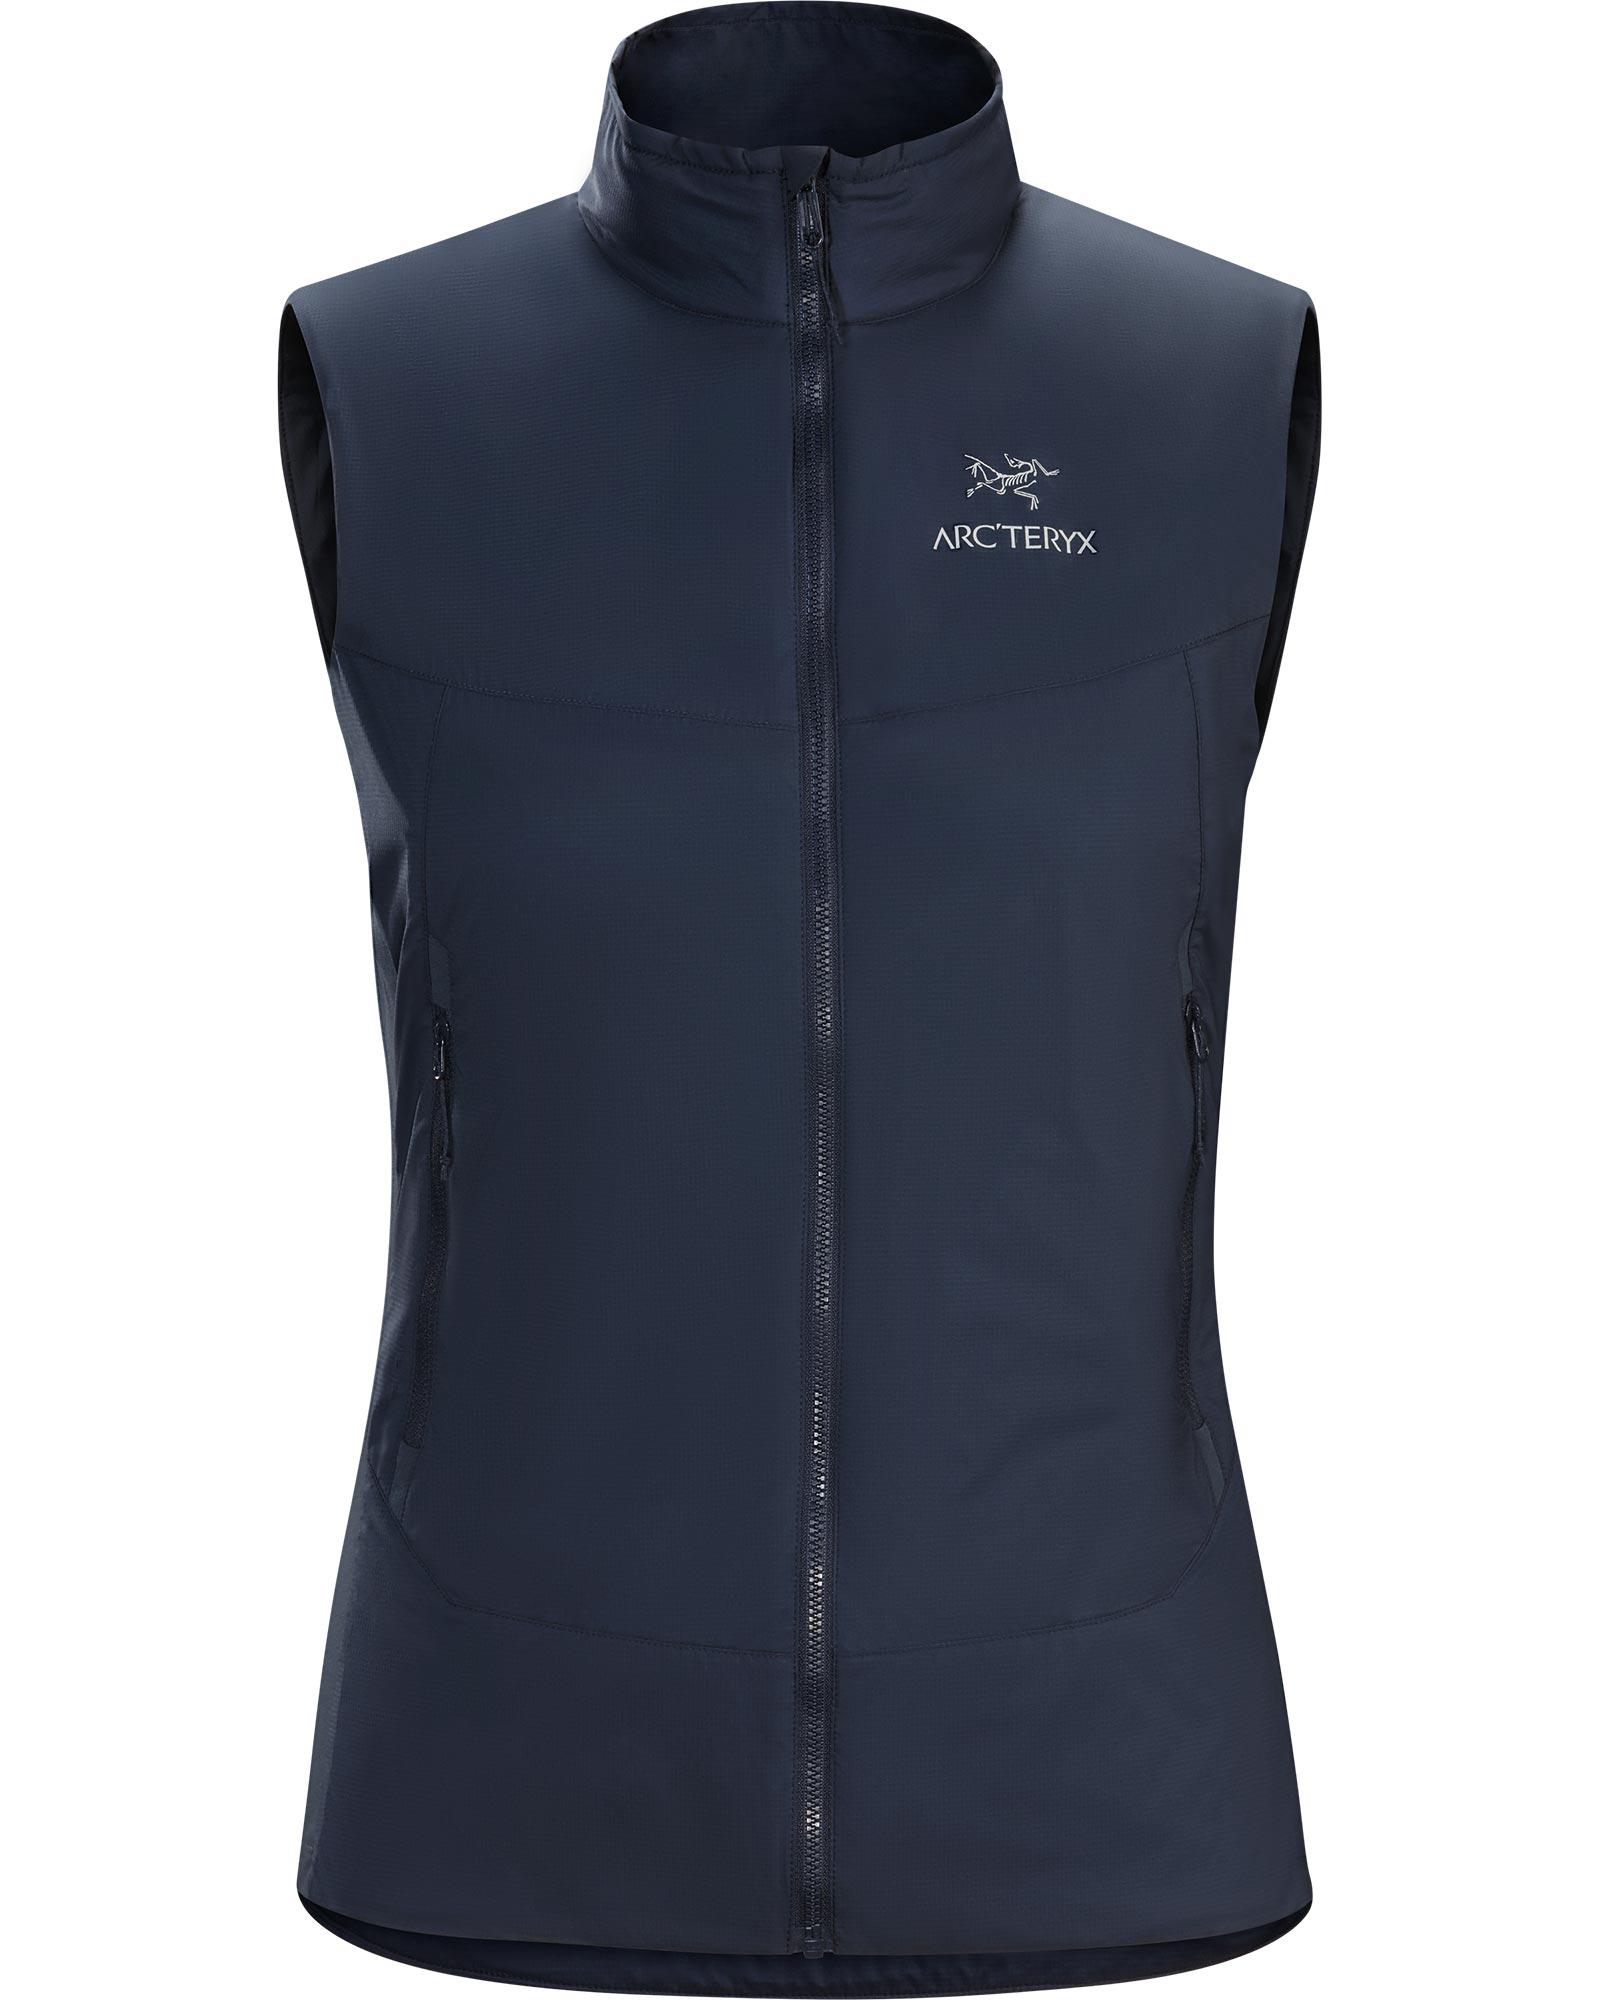 Arc'teryx Women's Atom SL Vest 0